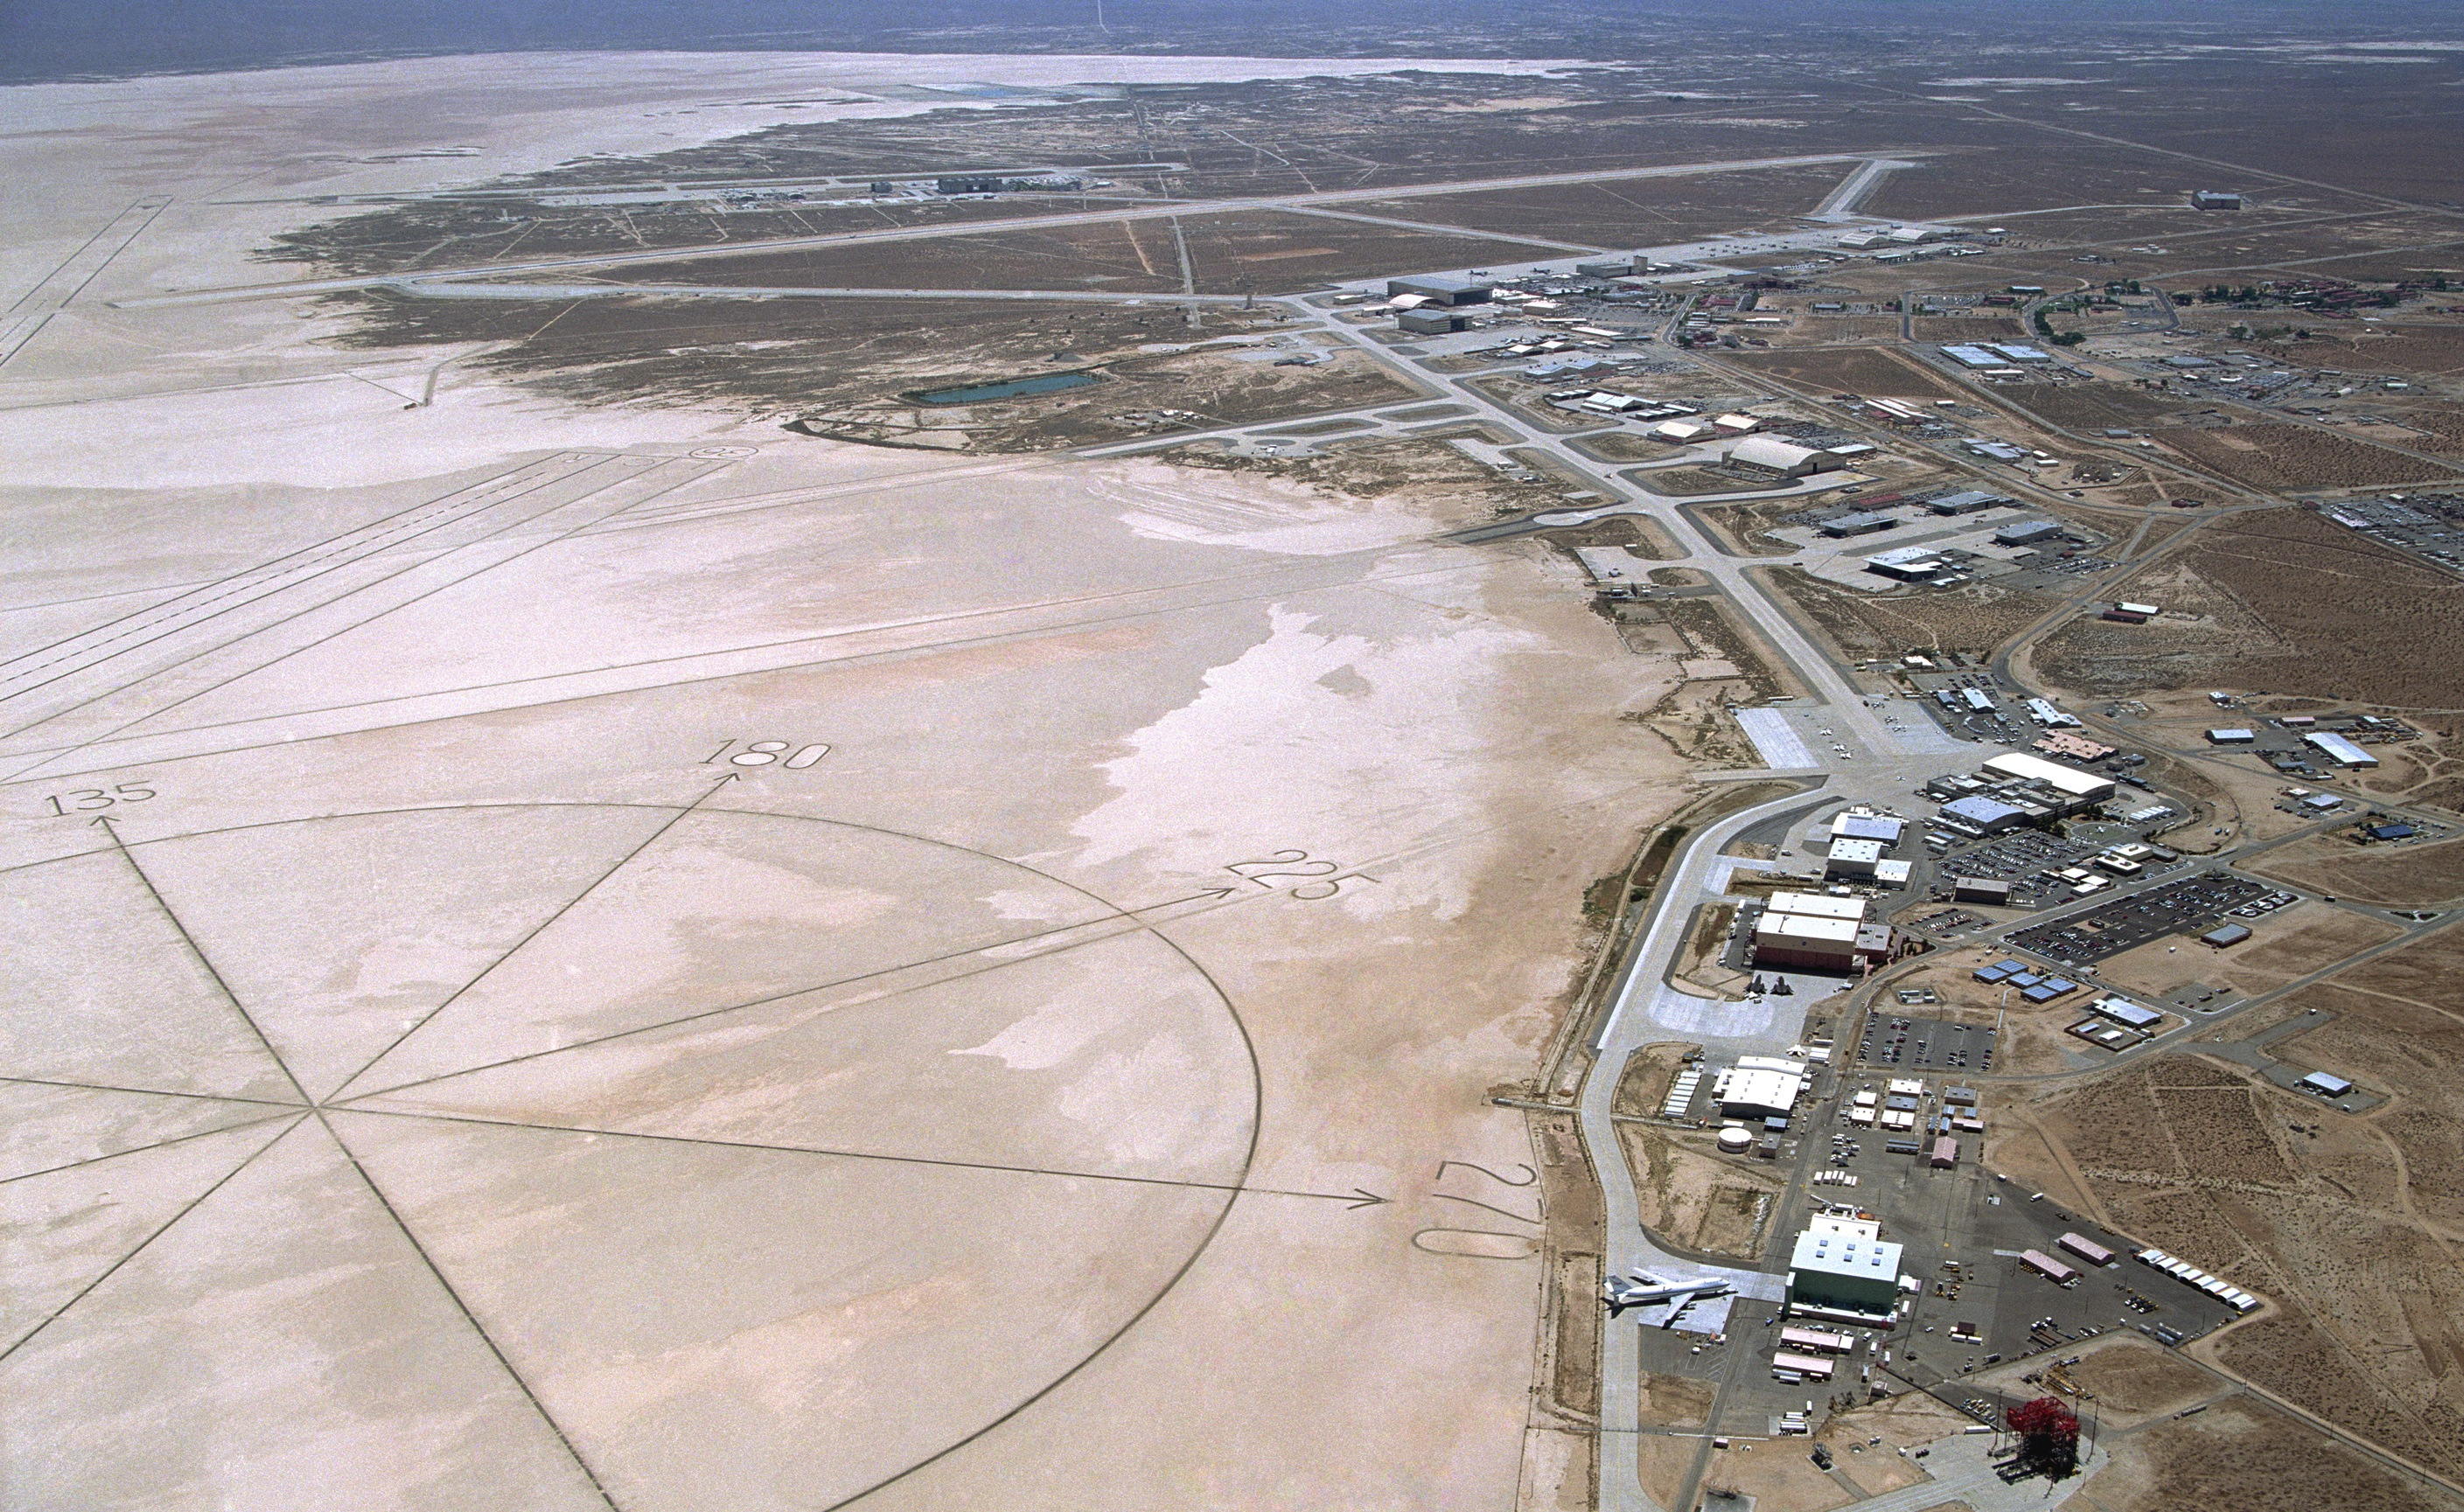 Dryden Flight Research Center, Edwards AFB, Califo